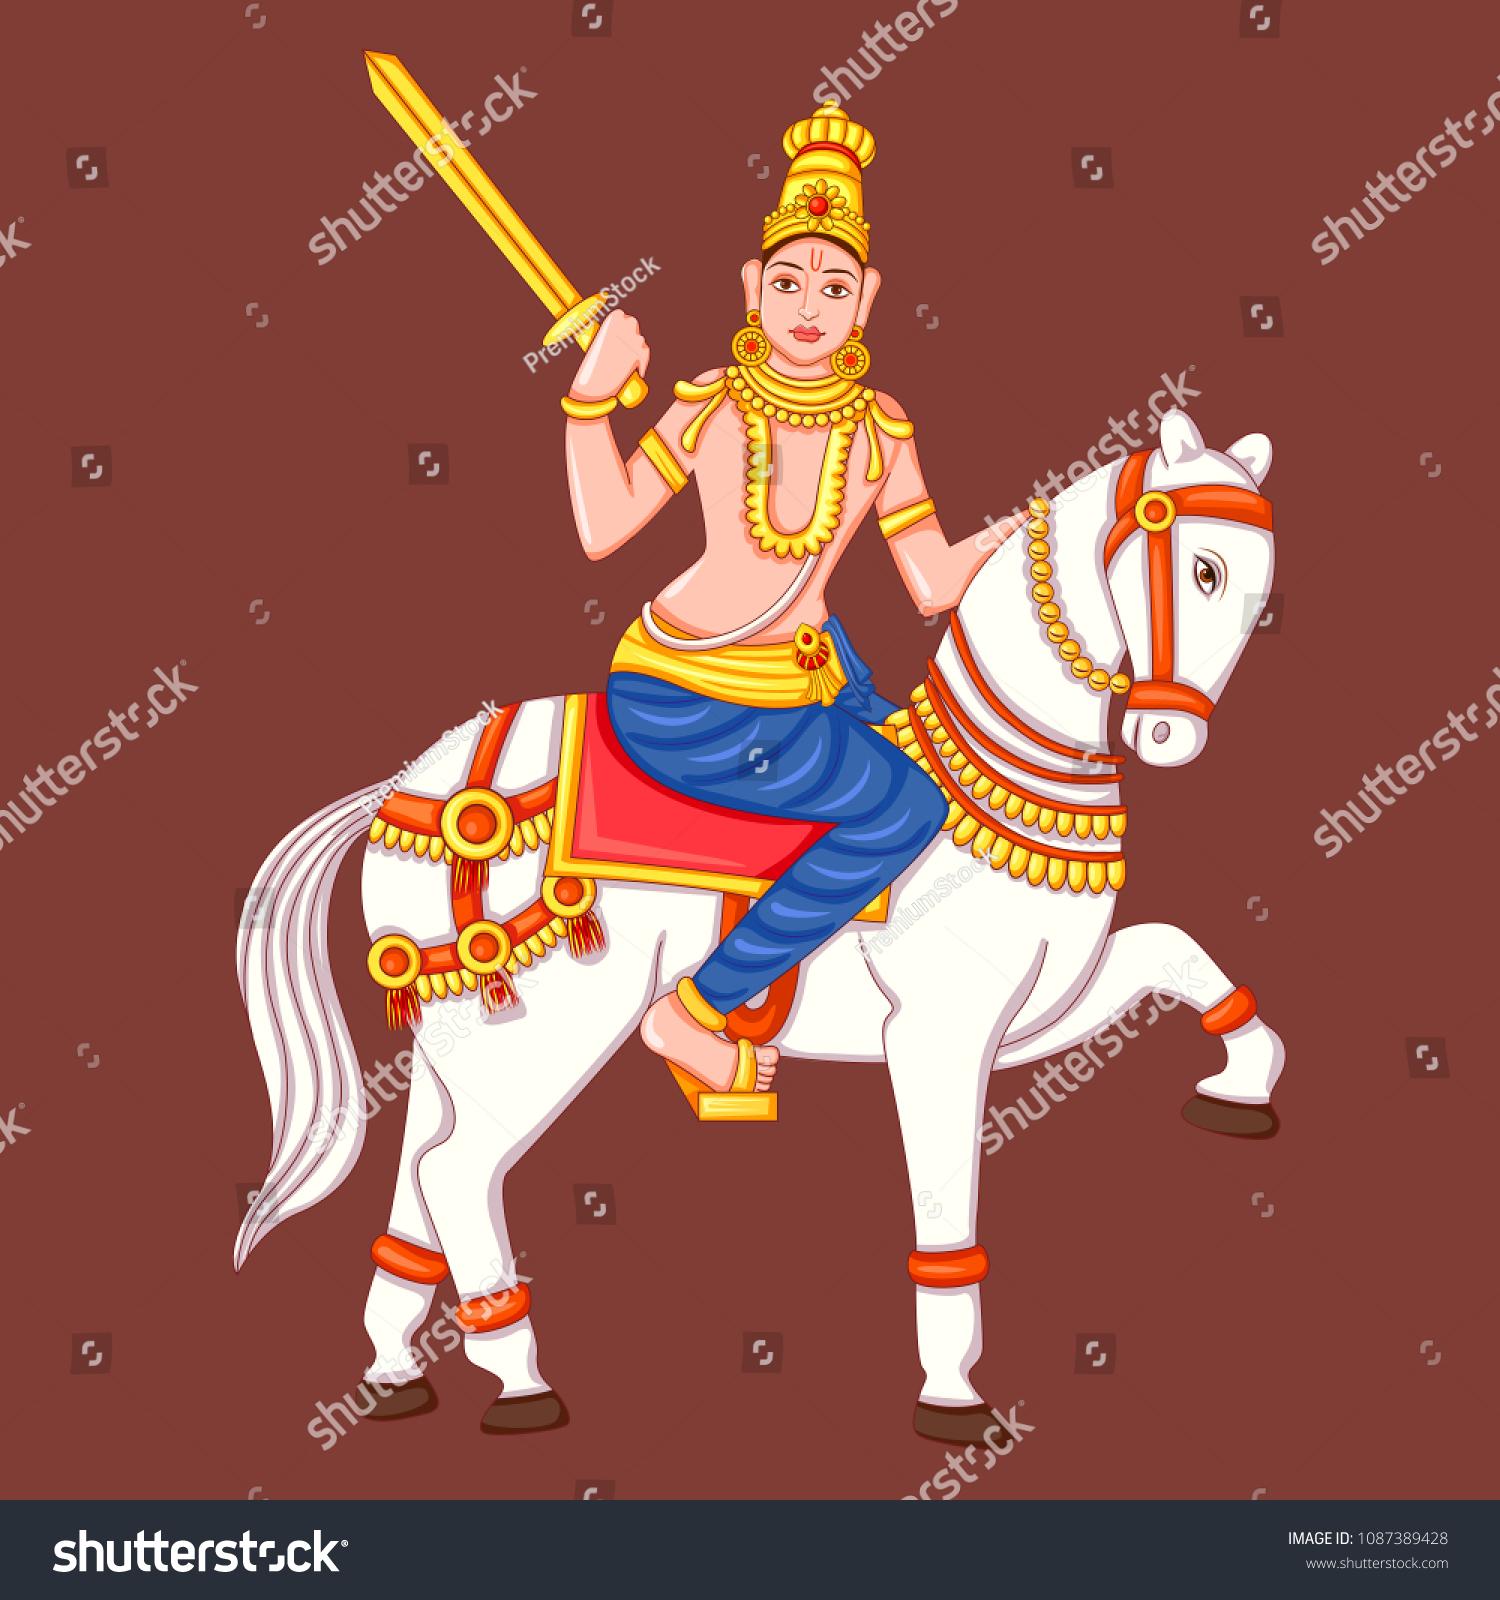 Vector Design Statue Indian Lord Kalki Stock Vector Royalty Free ...